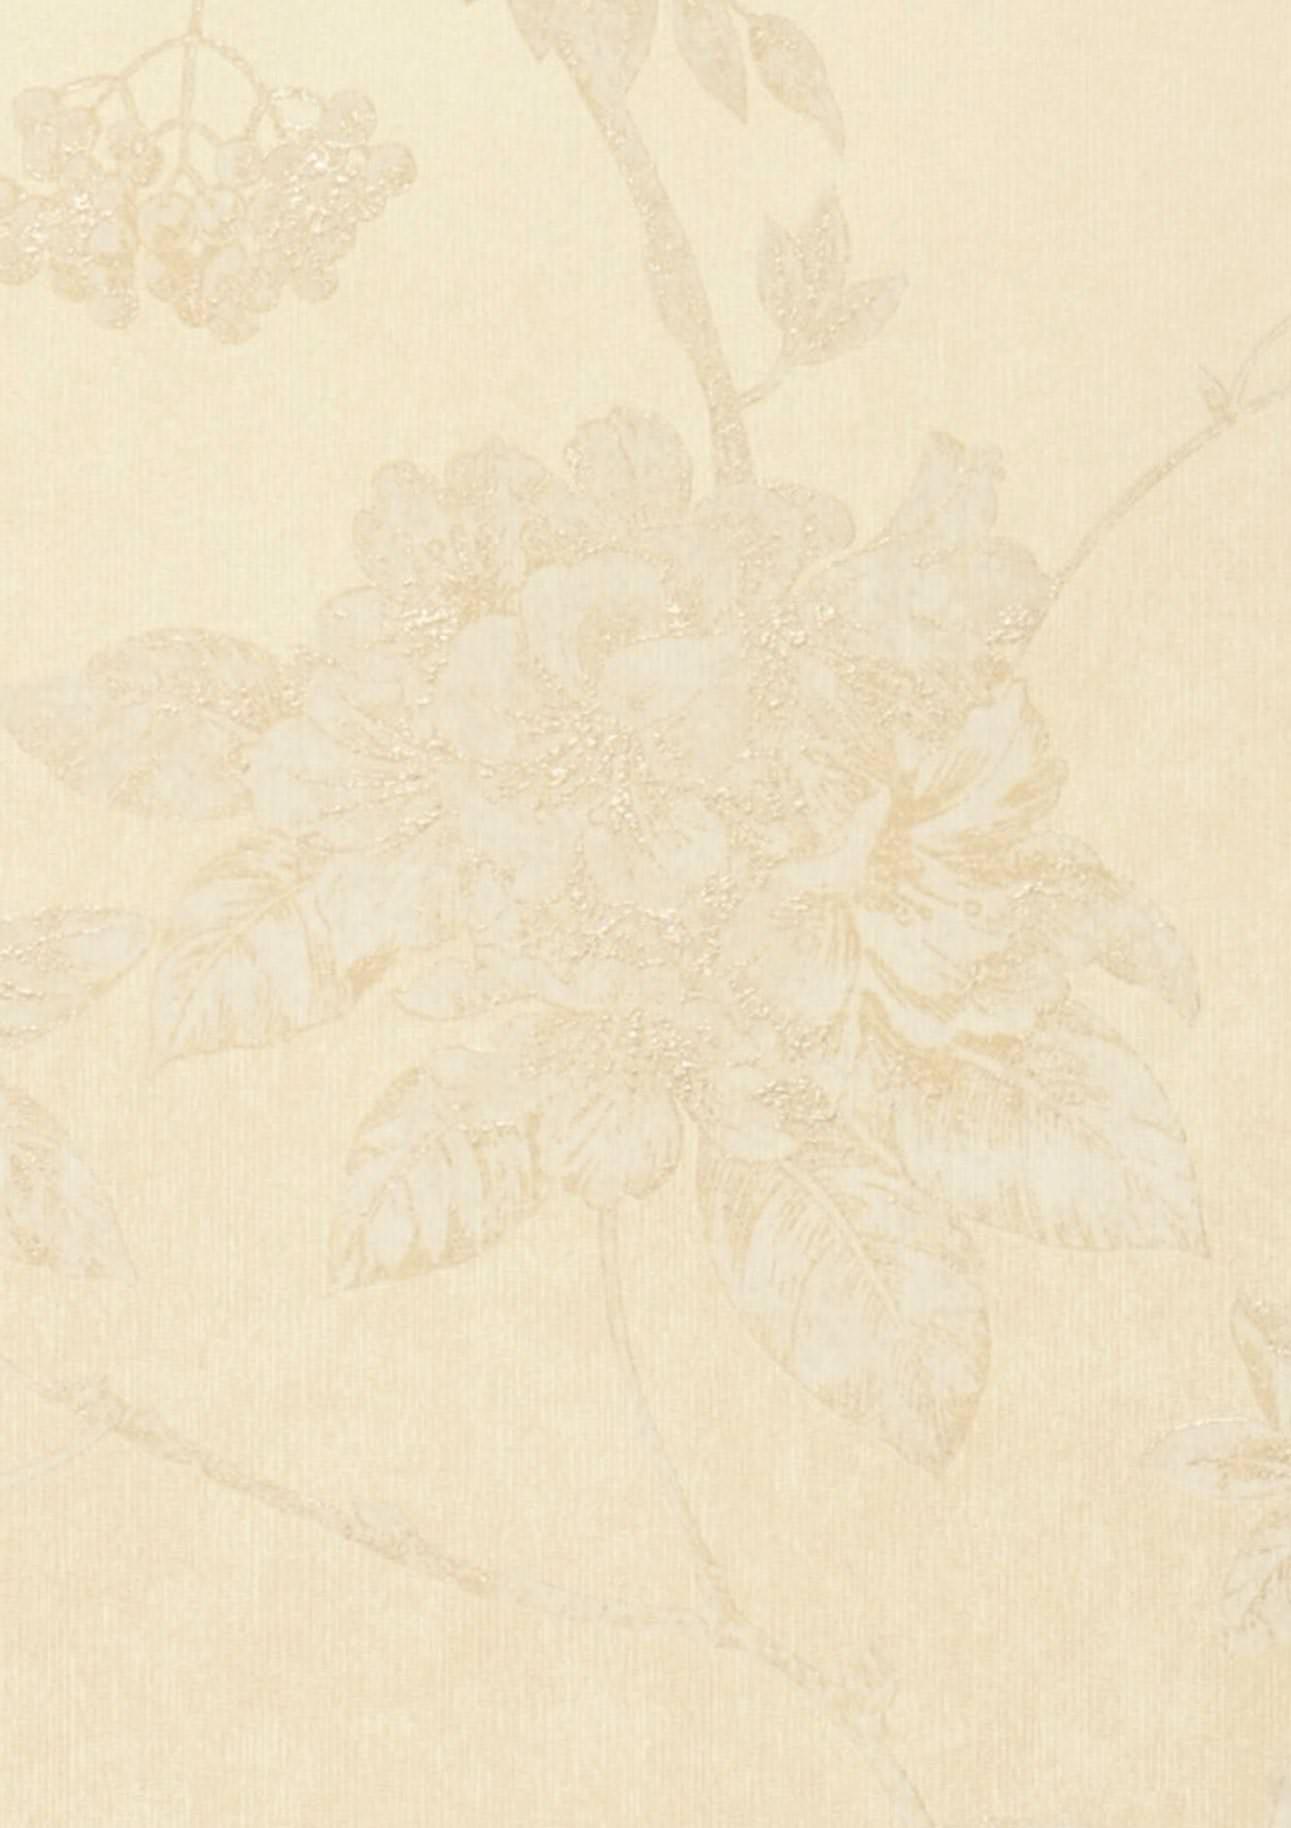 Papier Peint Tacita Ivoire Clair Blanc Cr Me Brillant